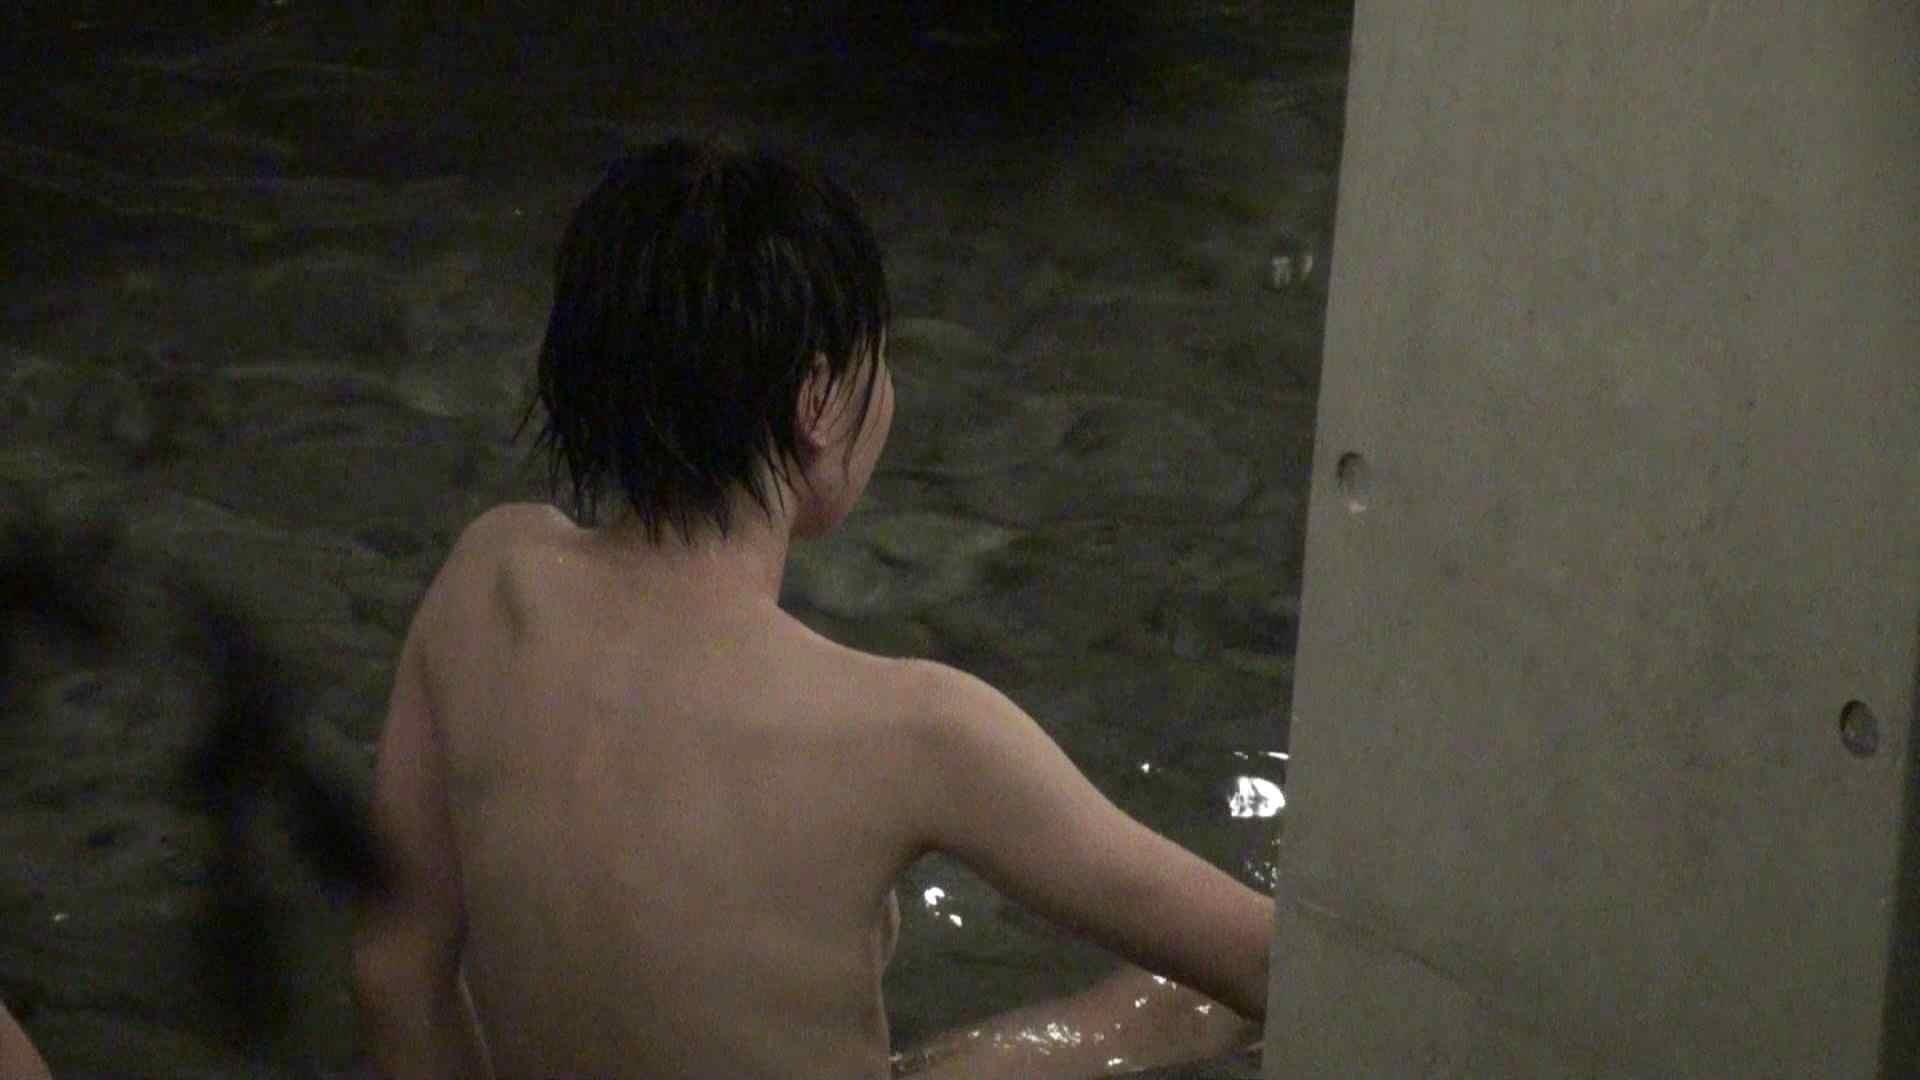 Aquaな露天風呂Vol.323 露天 AV無料動画キャプチャ 69連発 43